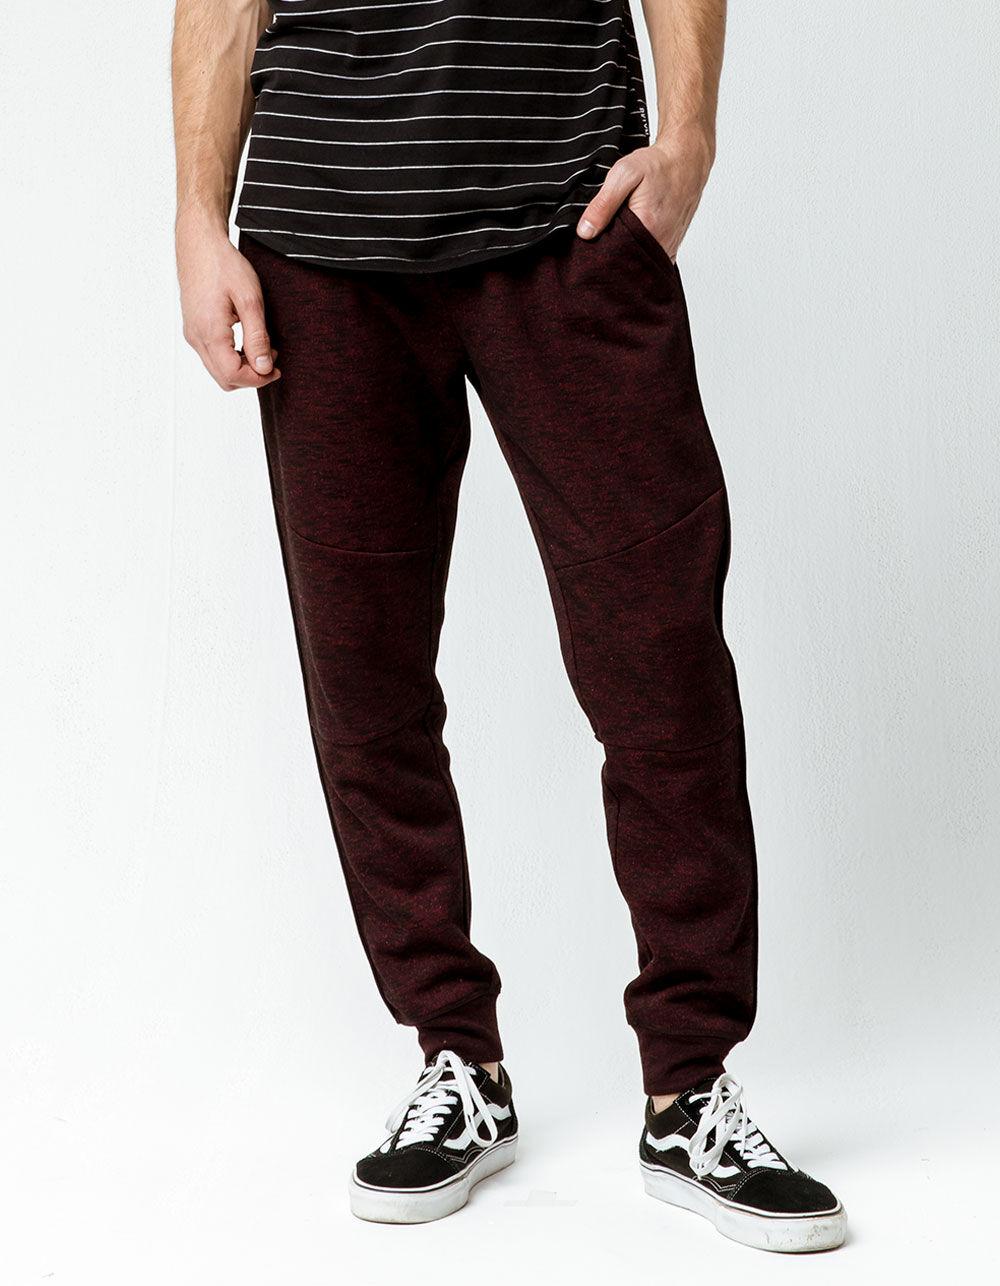 Image of BROOKLYN CLOTH JOGGER PANTS